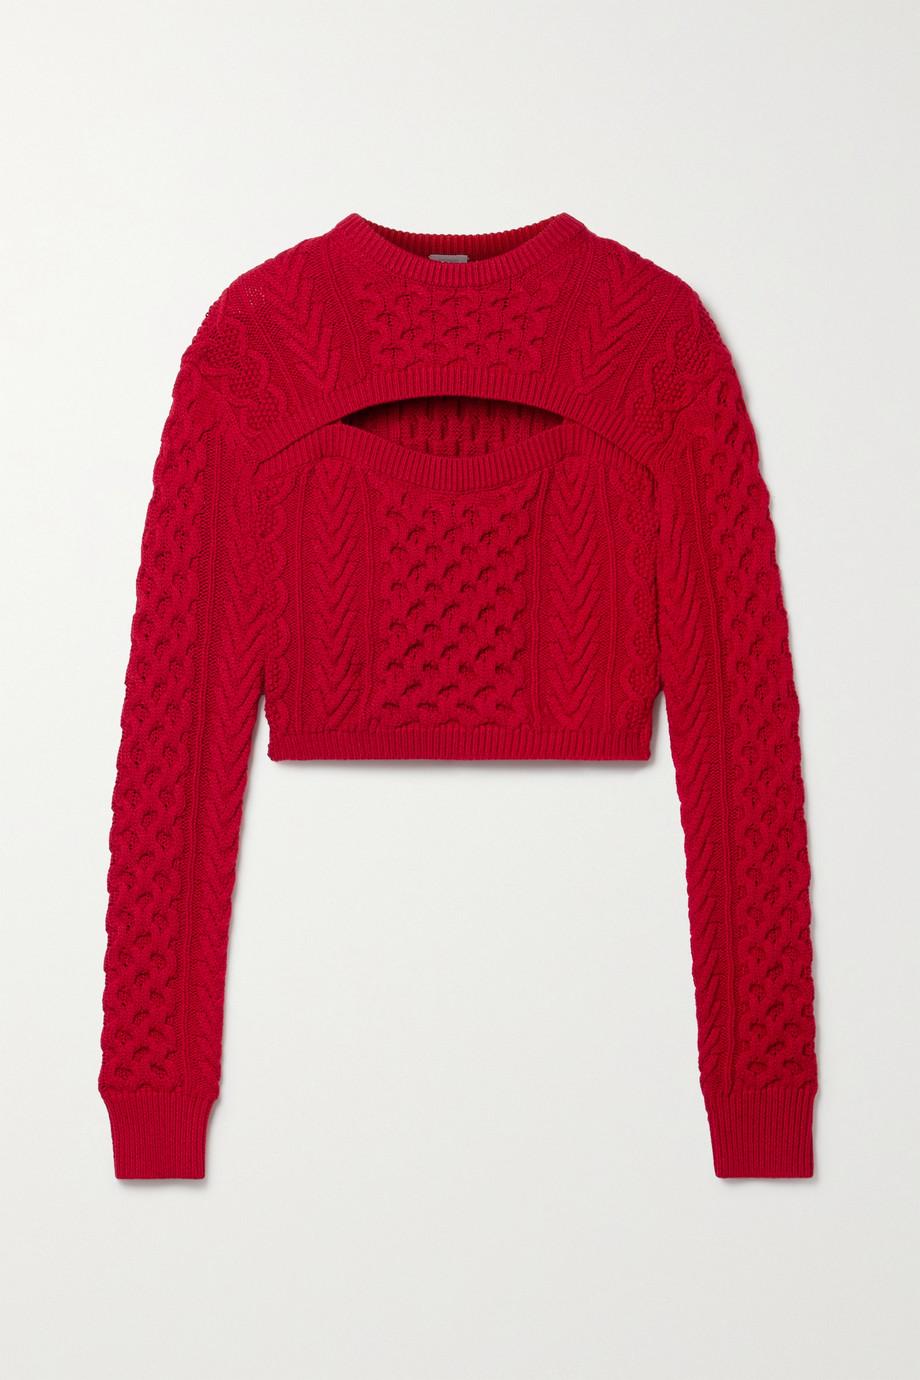 Rosie Assoulin Thousand in One Ways convertible merino wool-blend sweater